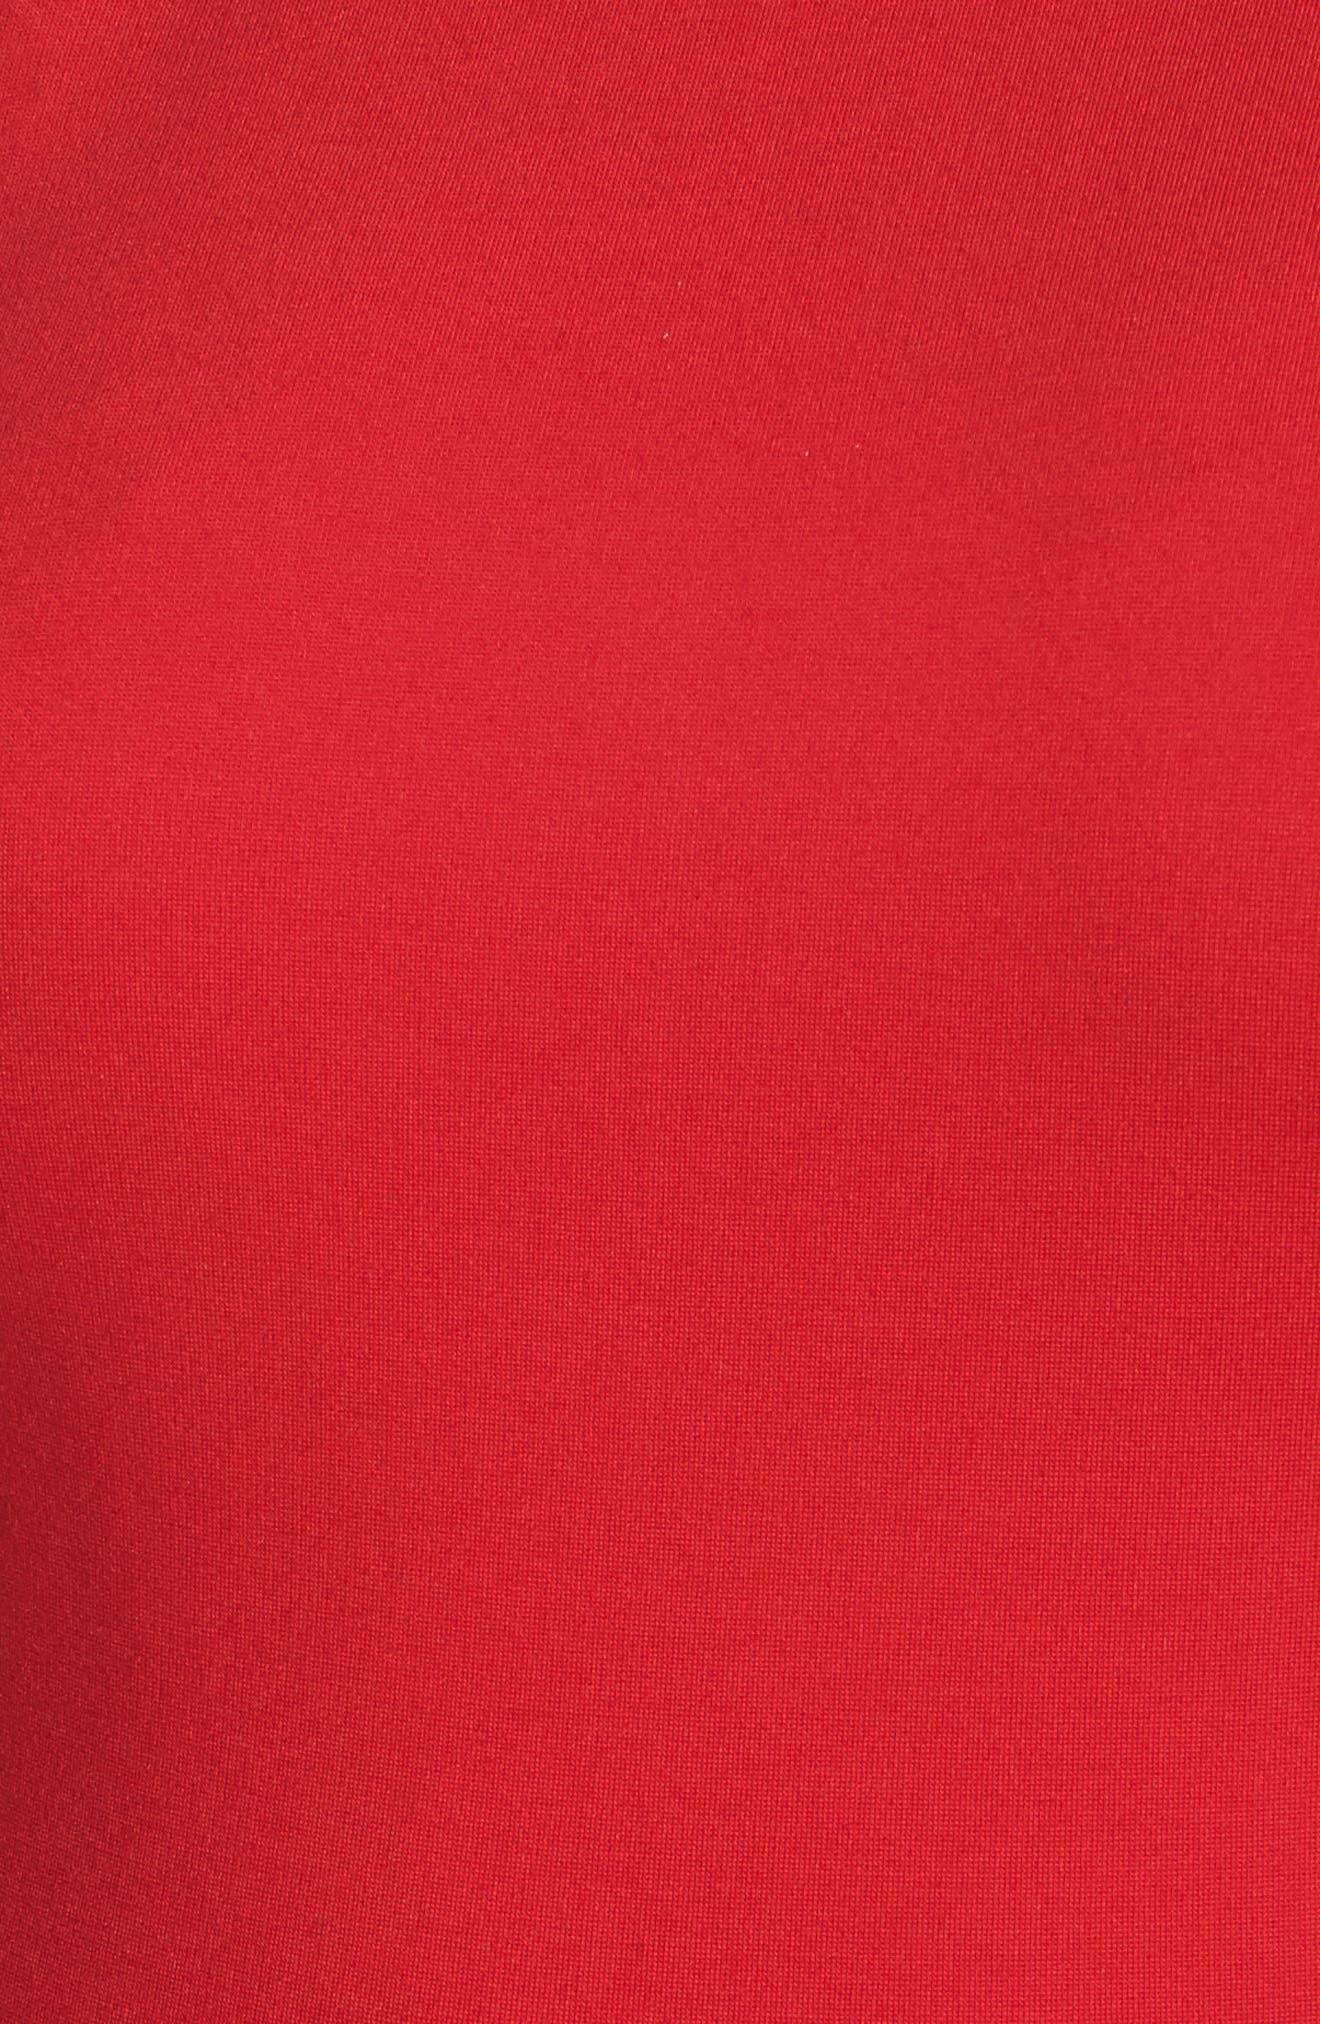 Rosa Fit & Flare Dress,                             Alternate thumbnail 5, color,